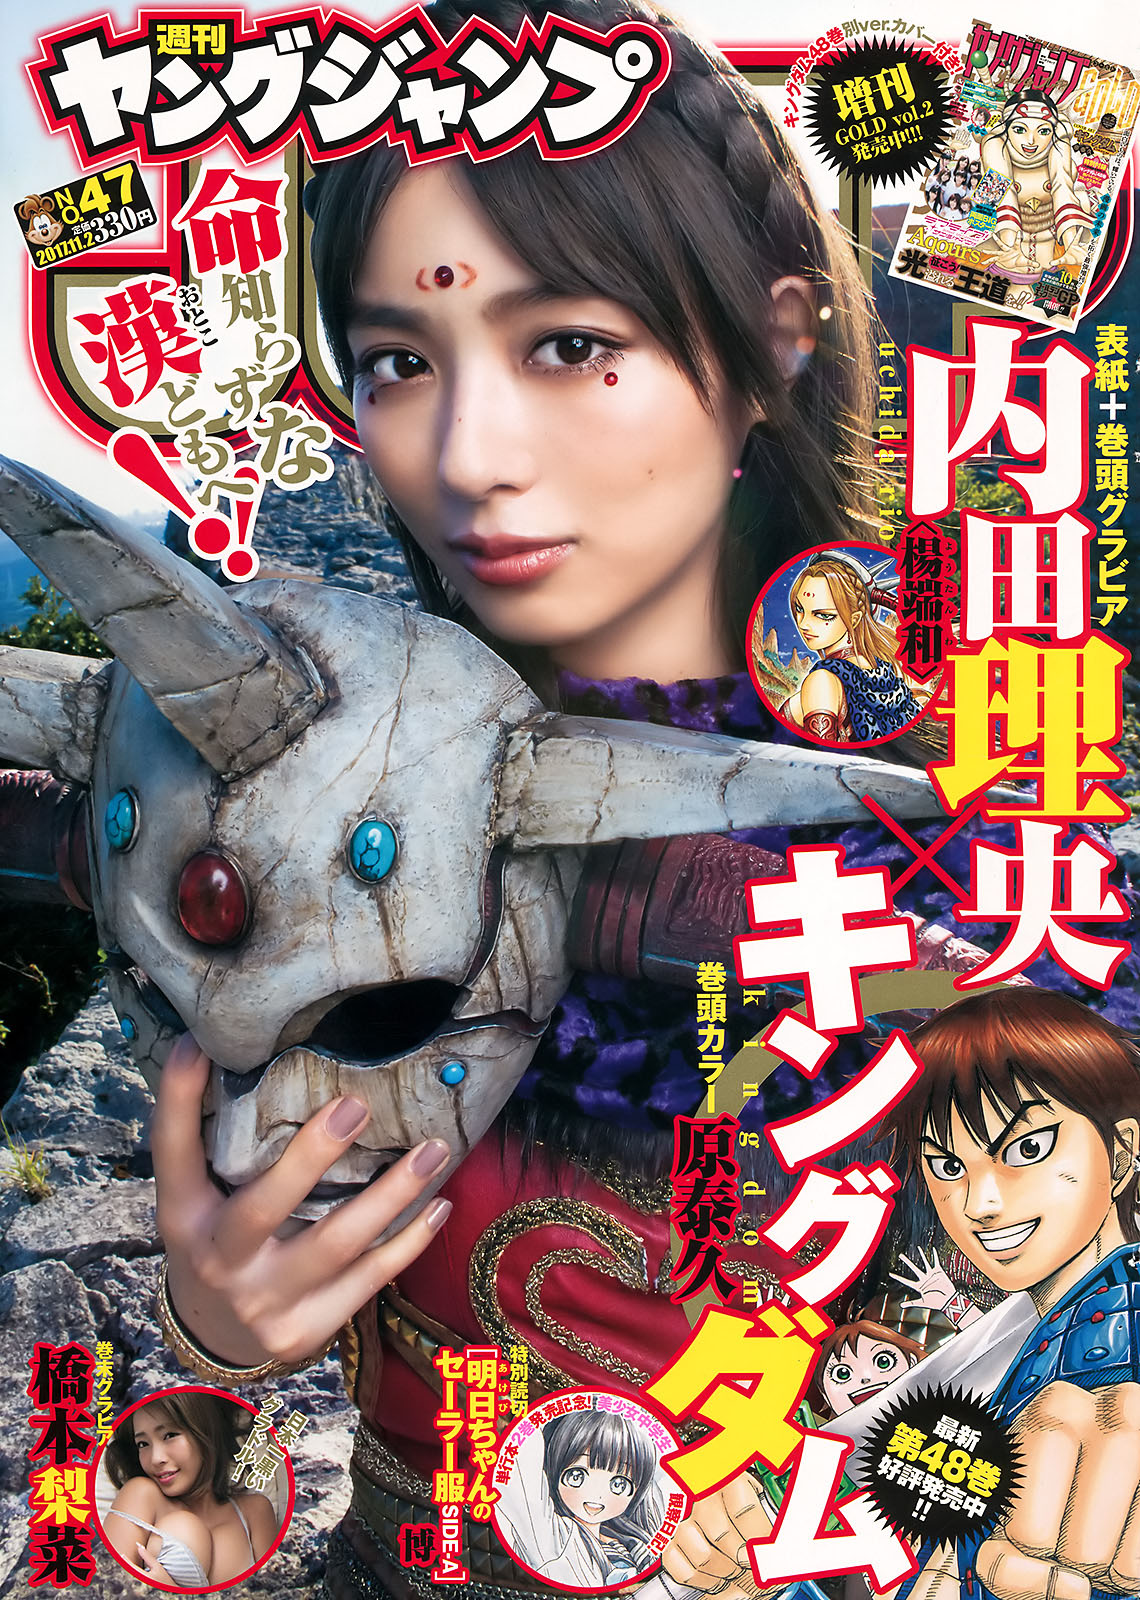 Rio Uchida 内田理央, Young Jump 2017 No.47 (週刊ヤングジャンプ 2017年47号)